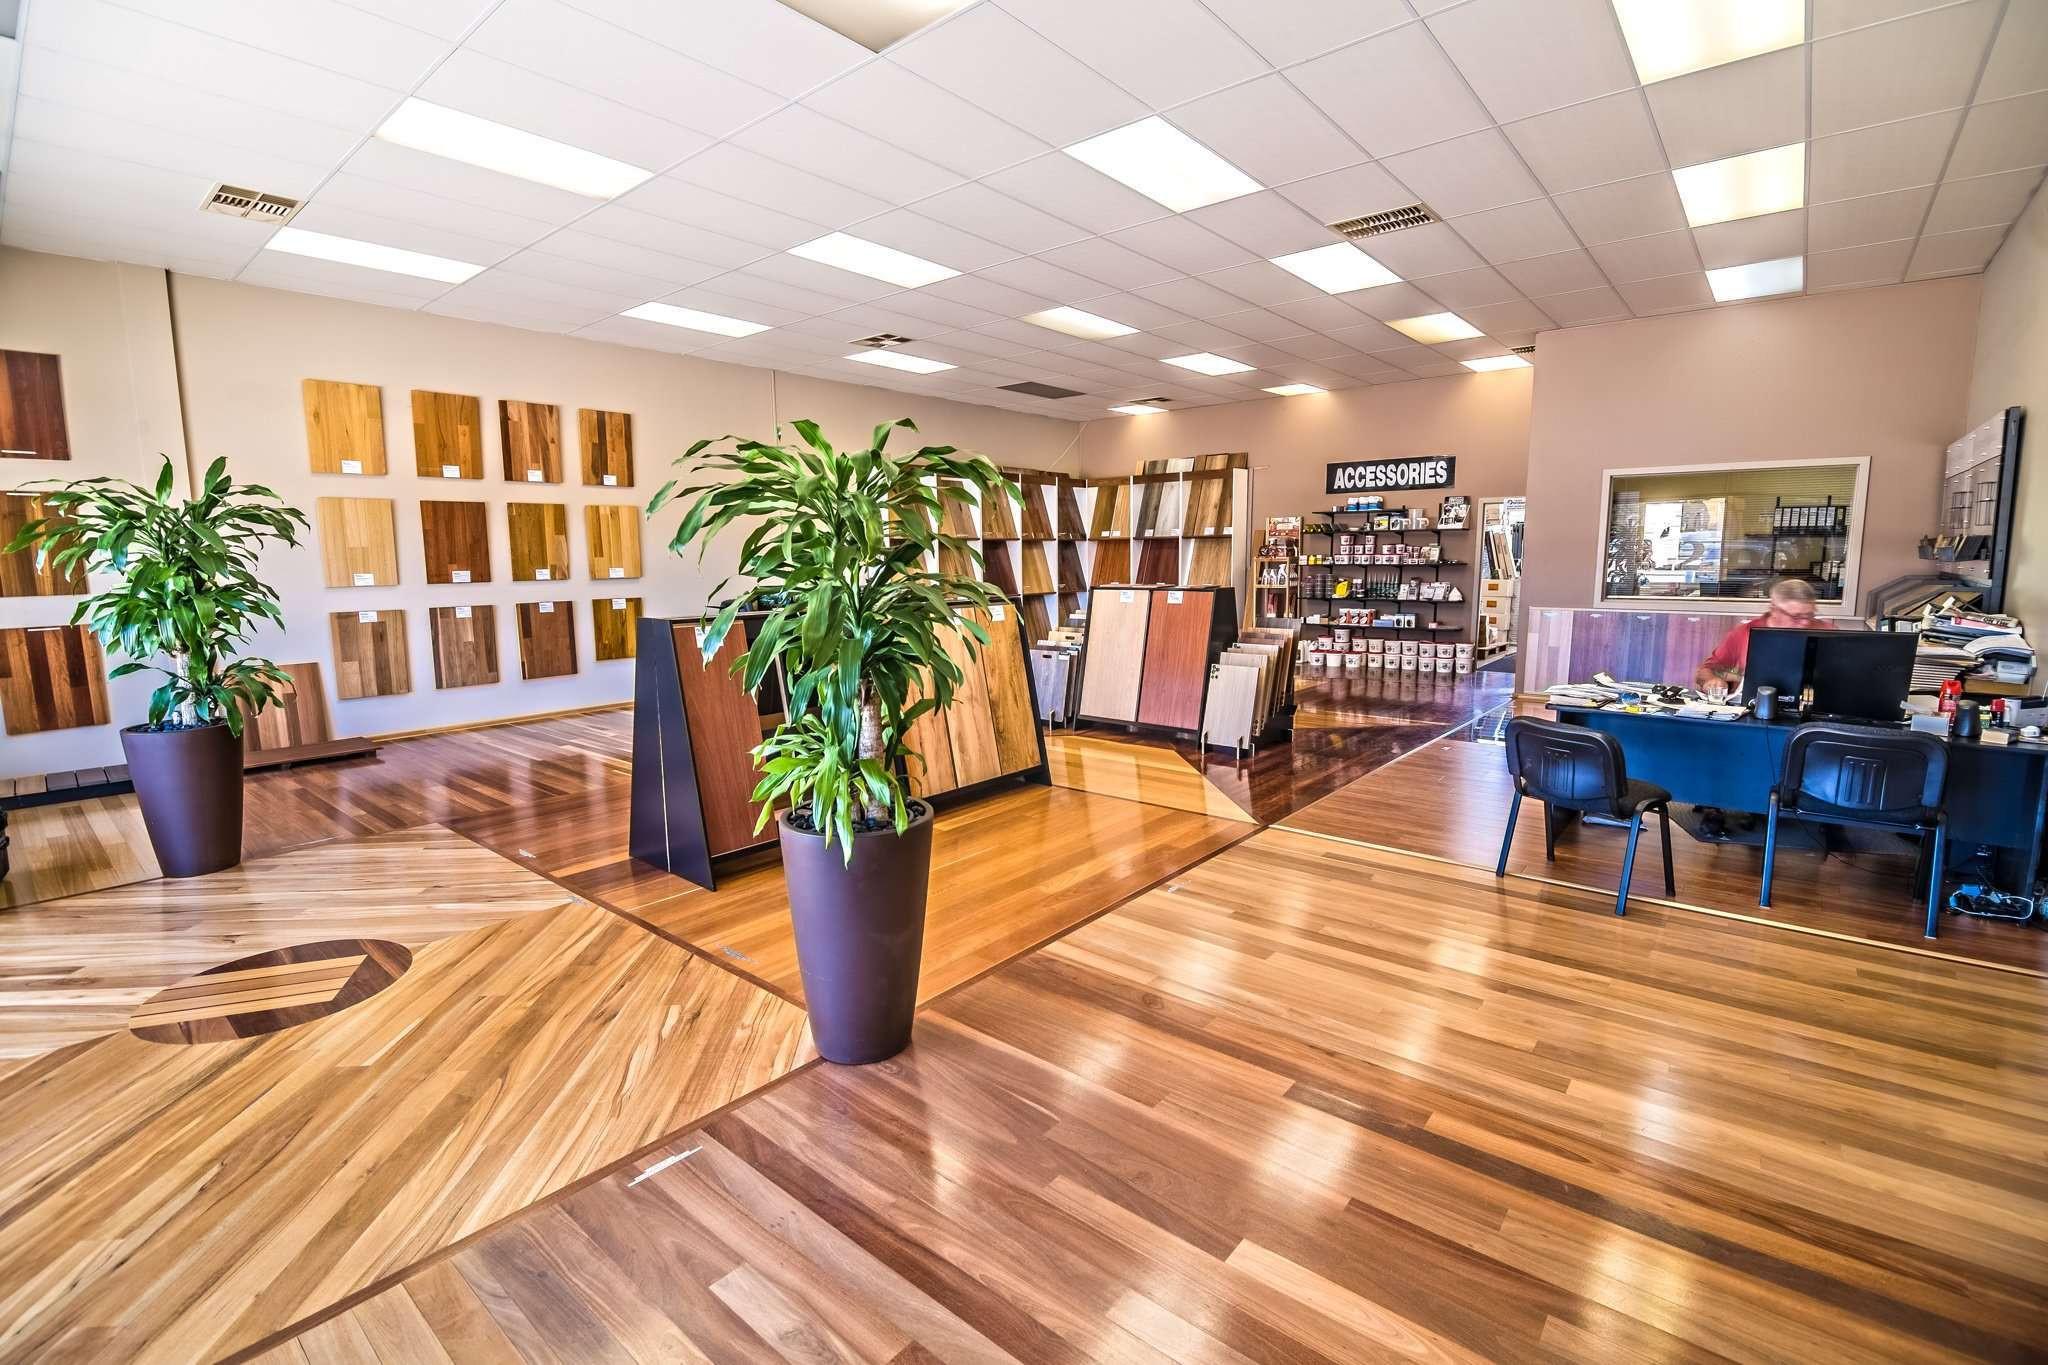 hardwood floor installation cost of wood floor price lists a1 wood floors regarding 4 1451 albany hwy cannington